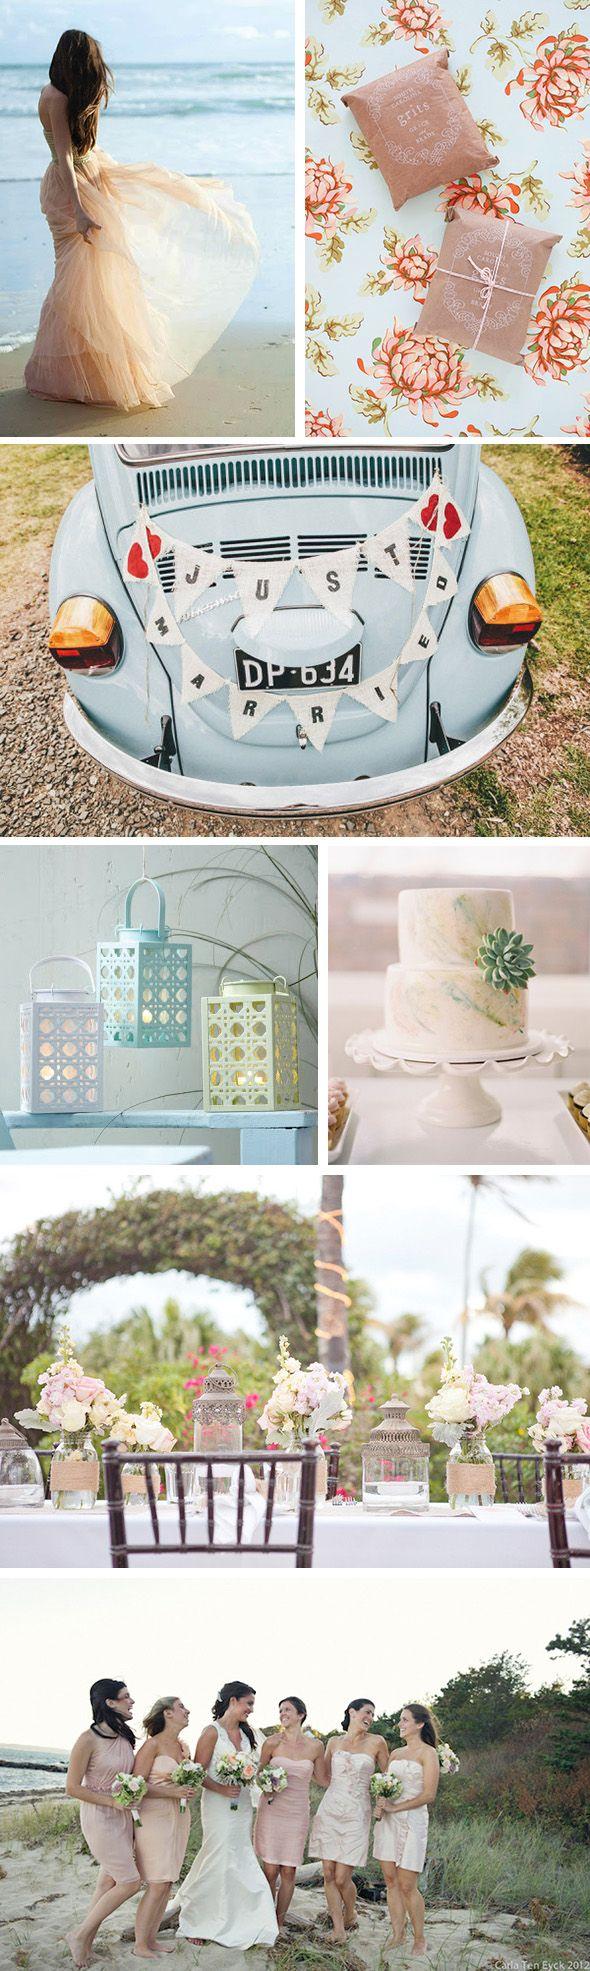 pastel beach weddings Pastel Weddings on the Beach